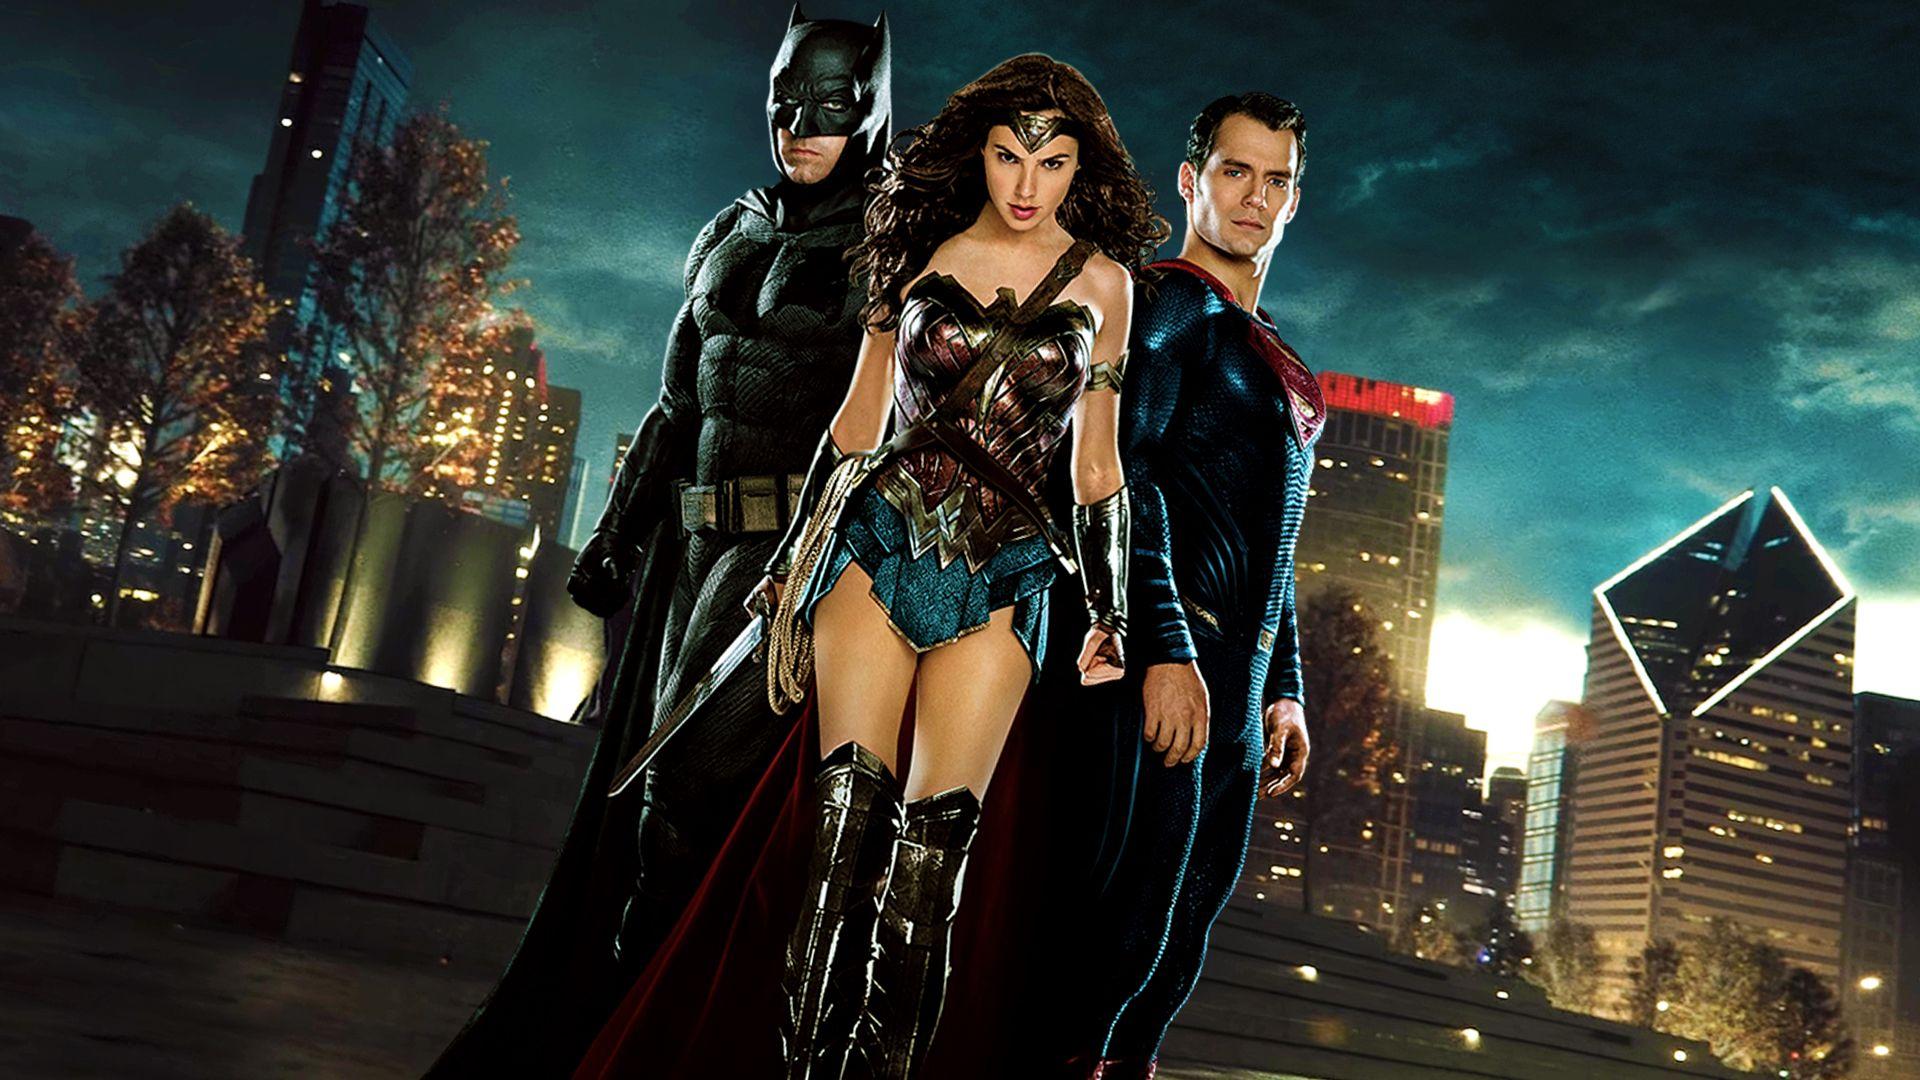 Batman Vs Superman HD Wallpapers Free latest Batman Vs